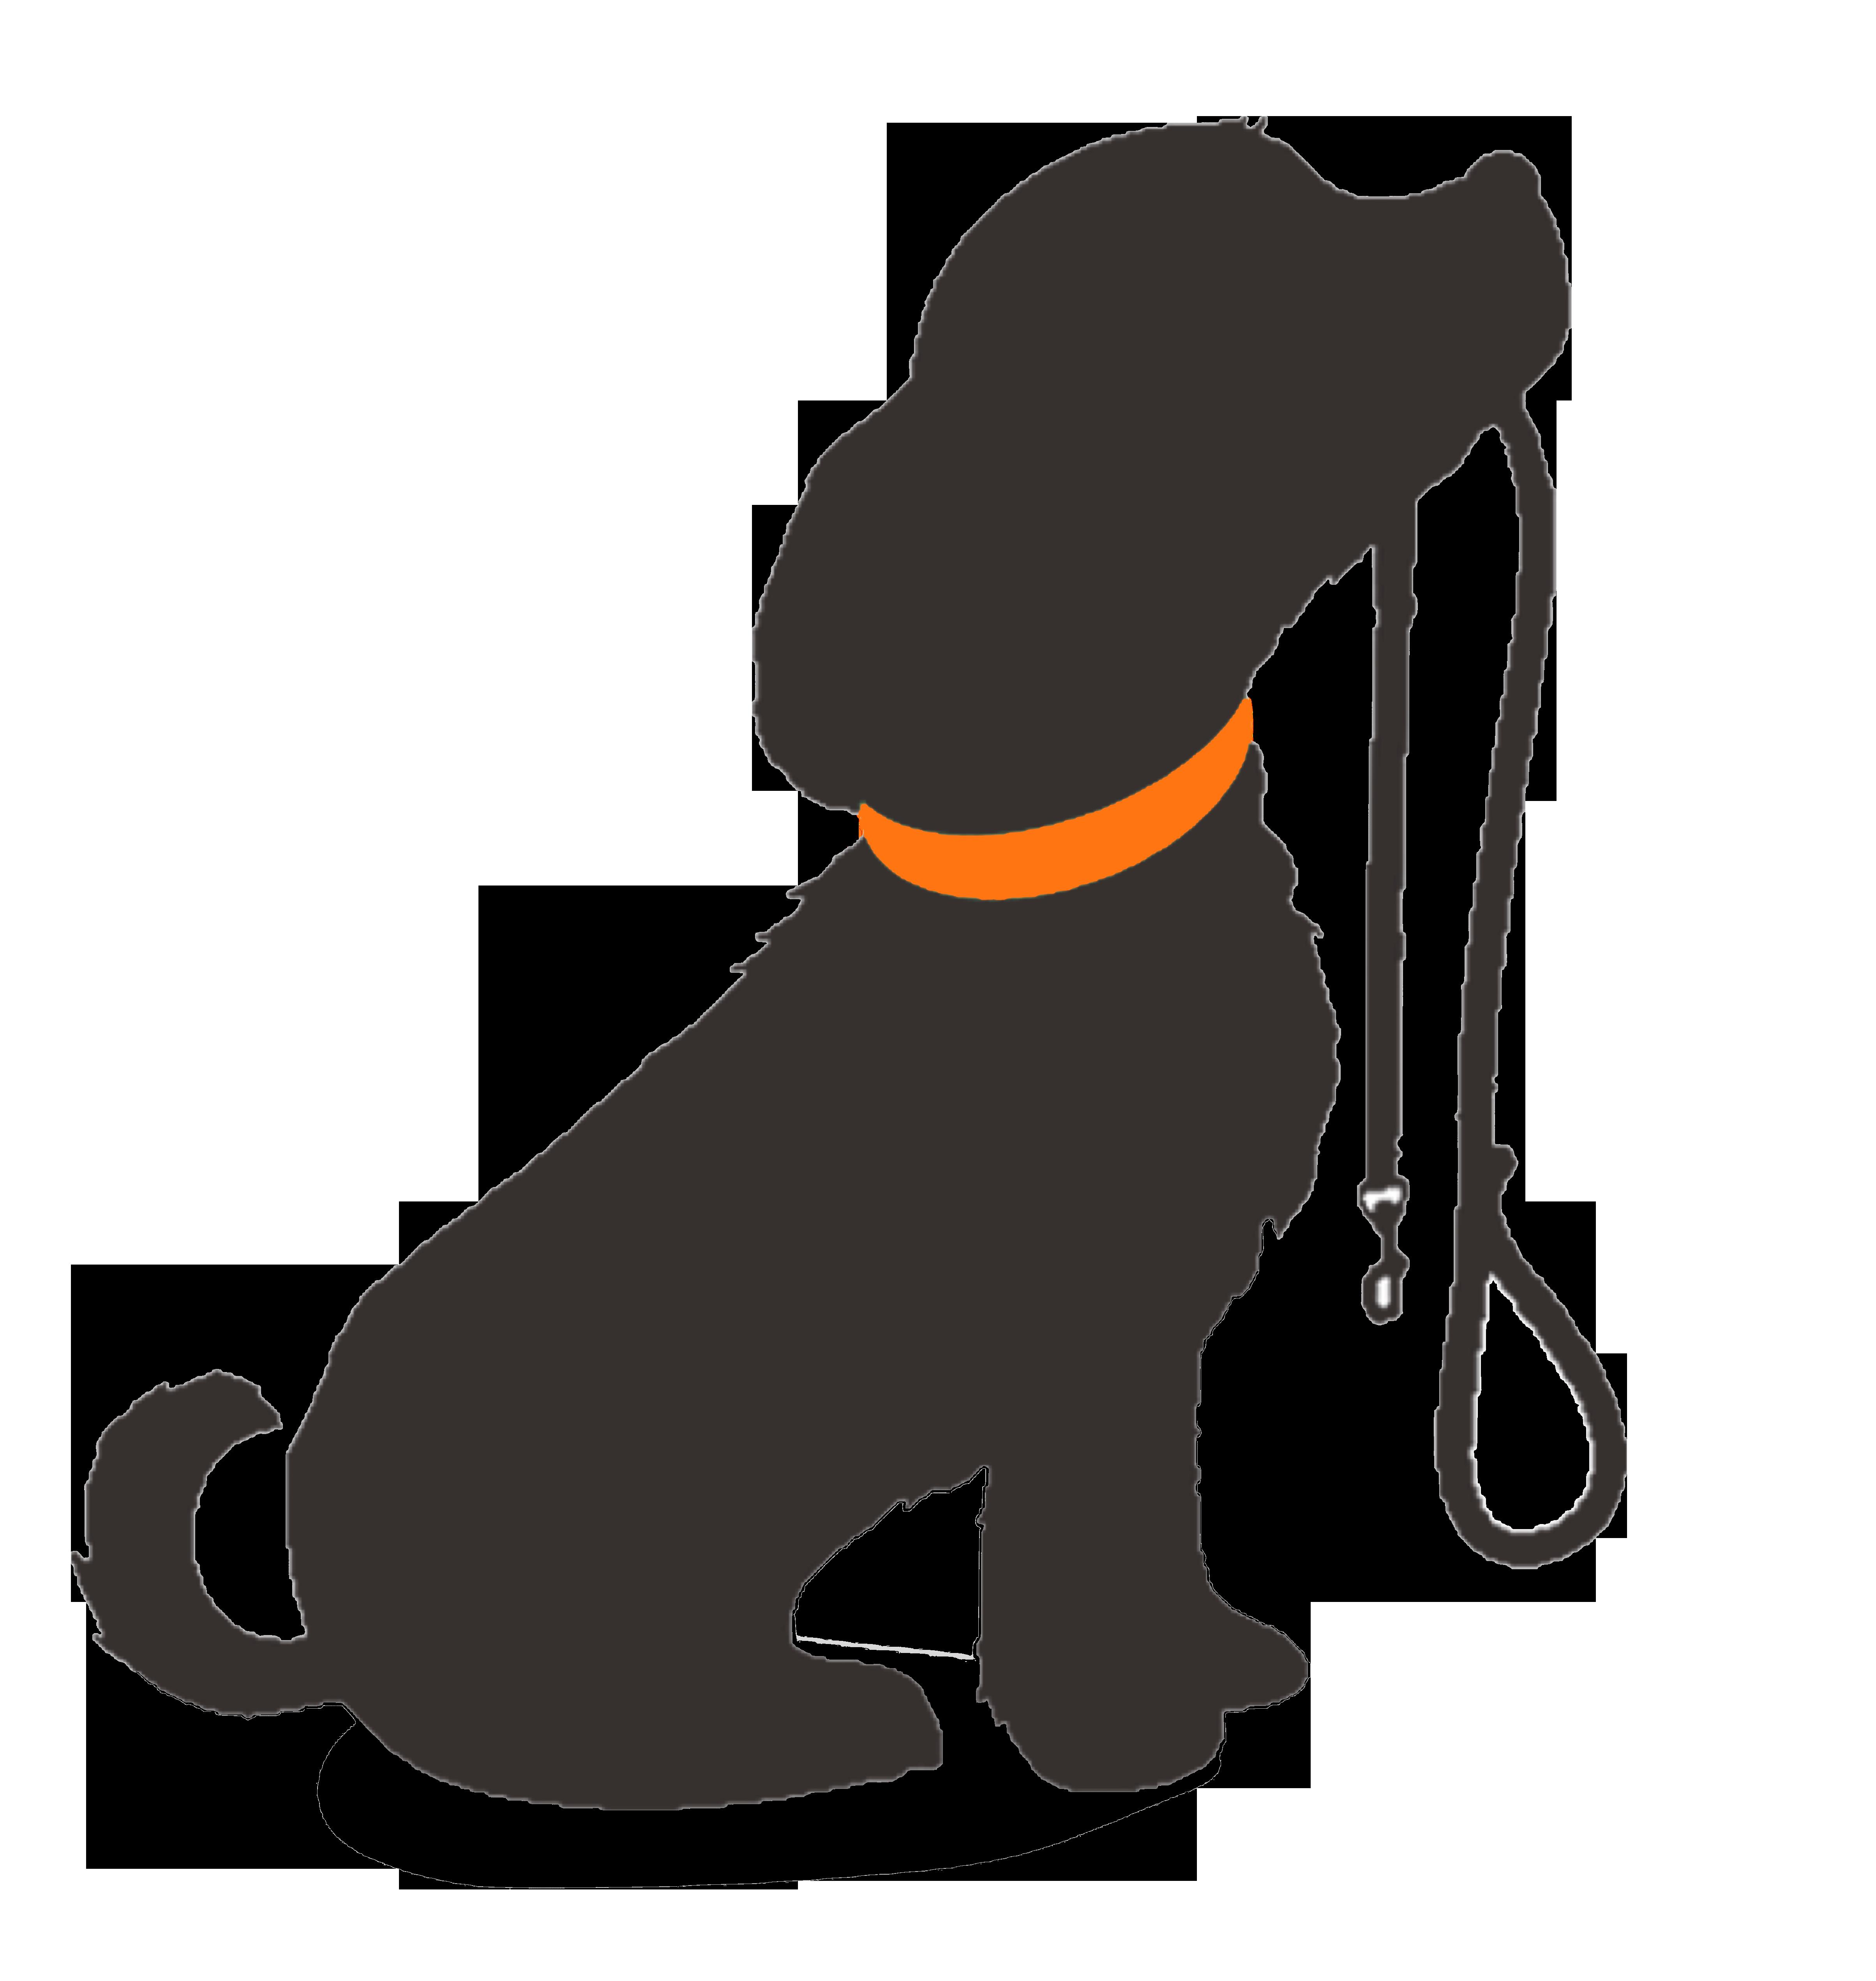 Collar free download best. Clipart dog logo